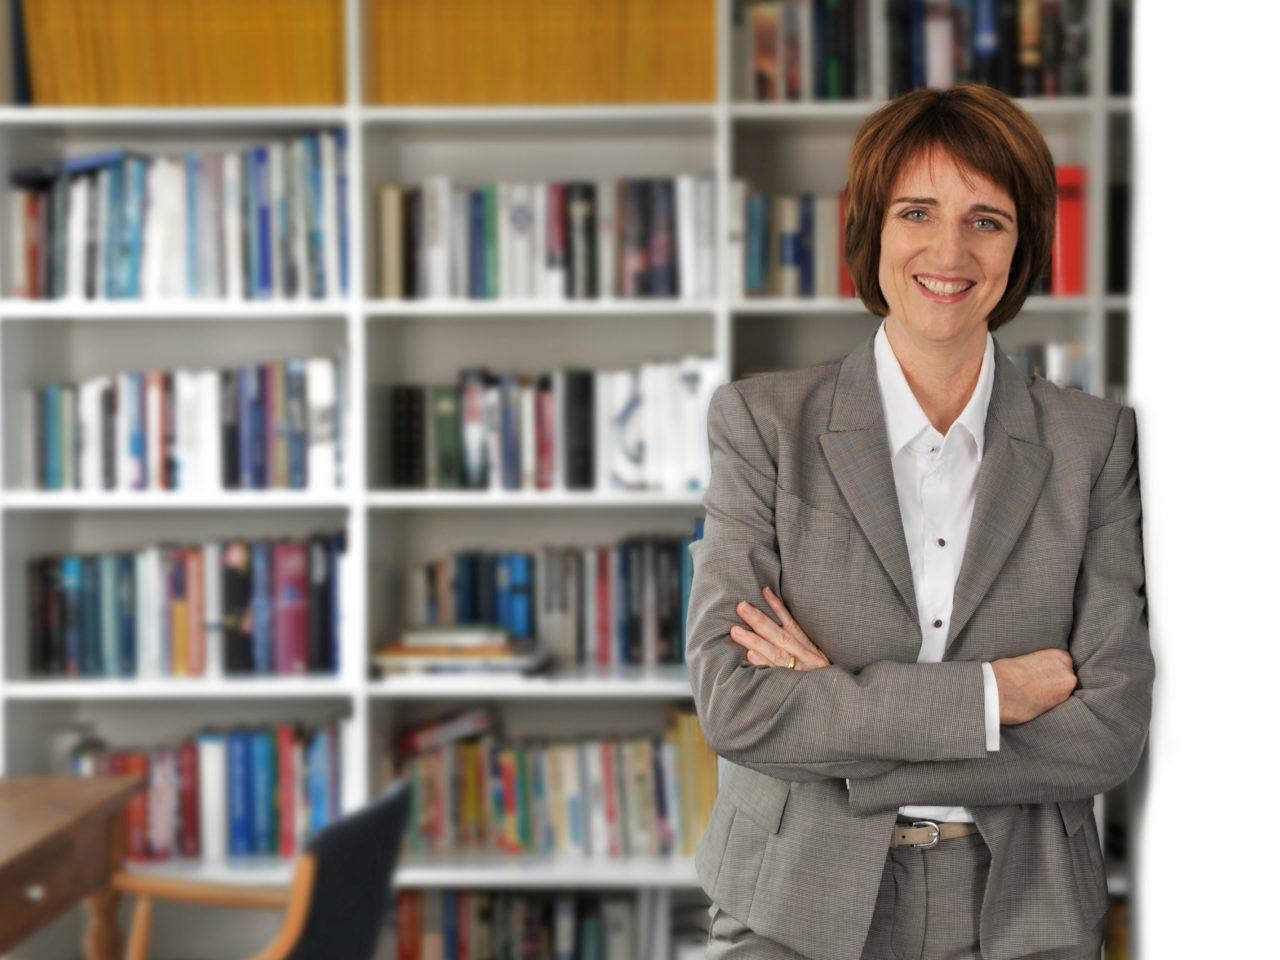 https://karriereberatung-pueschel.de/wp-content/uploads/2021/03/Dr.AntoniaPueschel-3-scaled-e1614799744722-1280x960.jpg